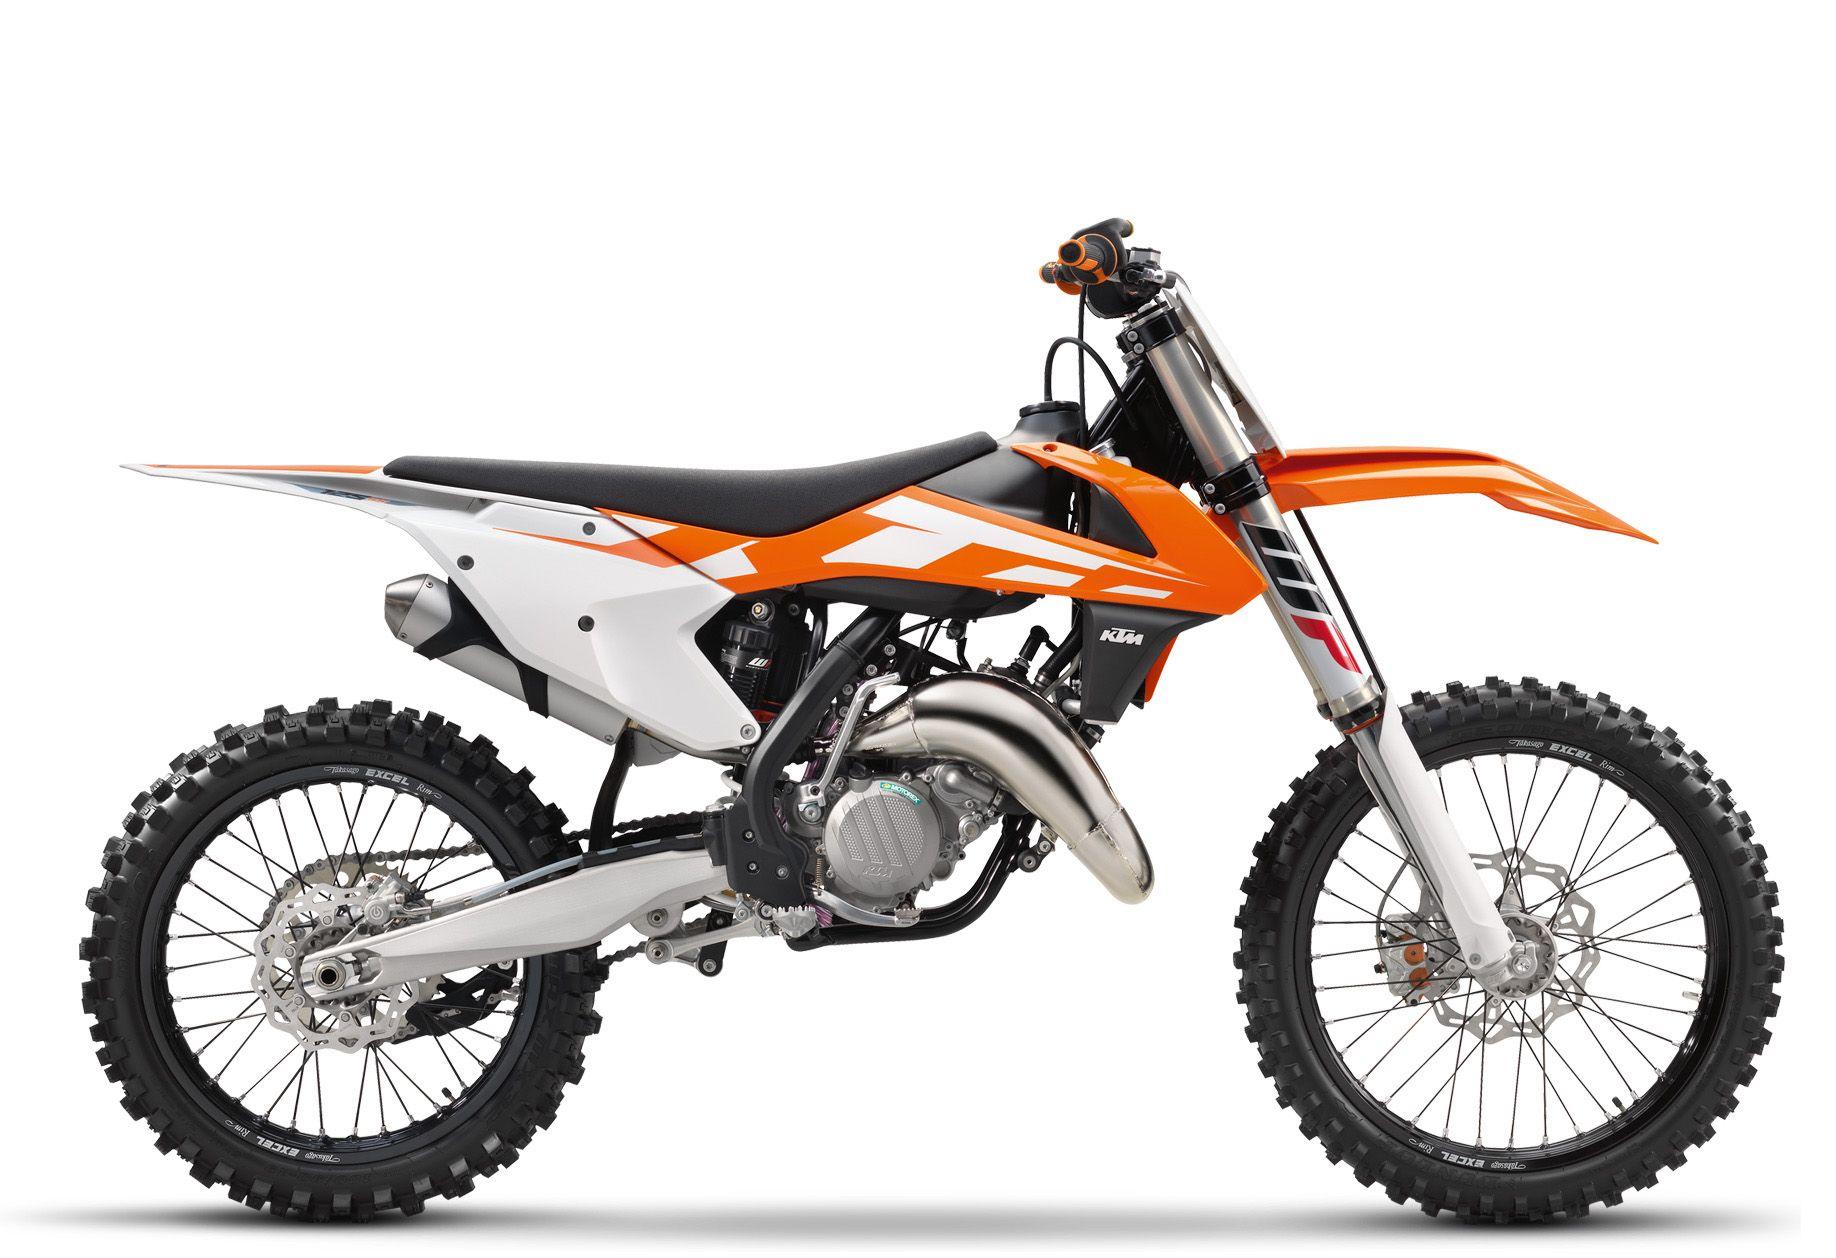 2016 Ktm 125 Sx Ktm Motocross Ktm Ktm 250